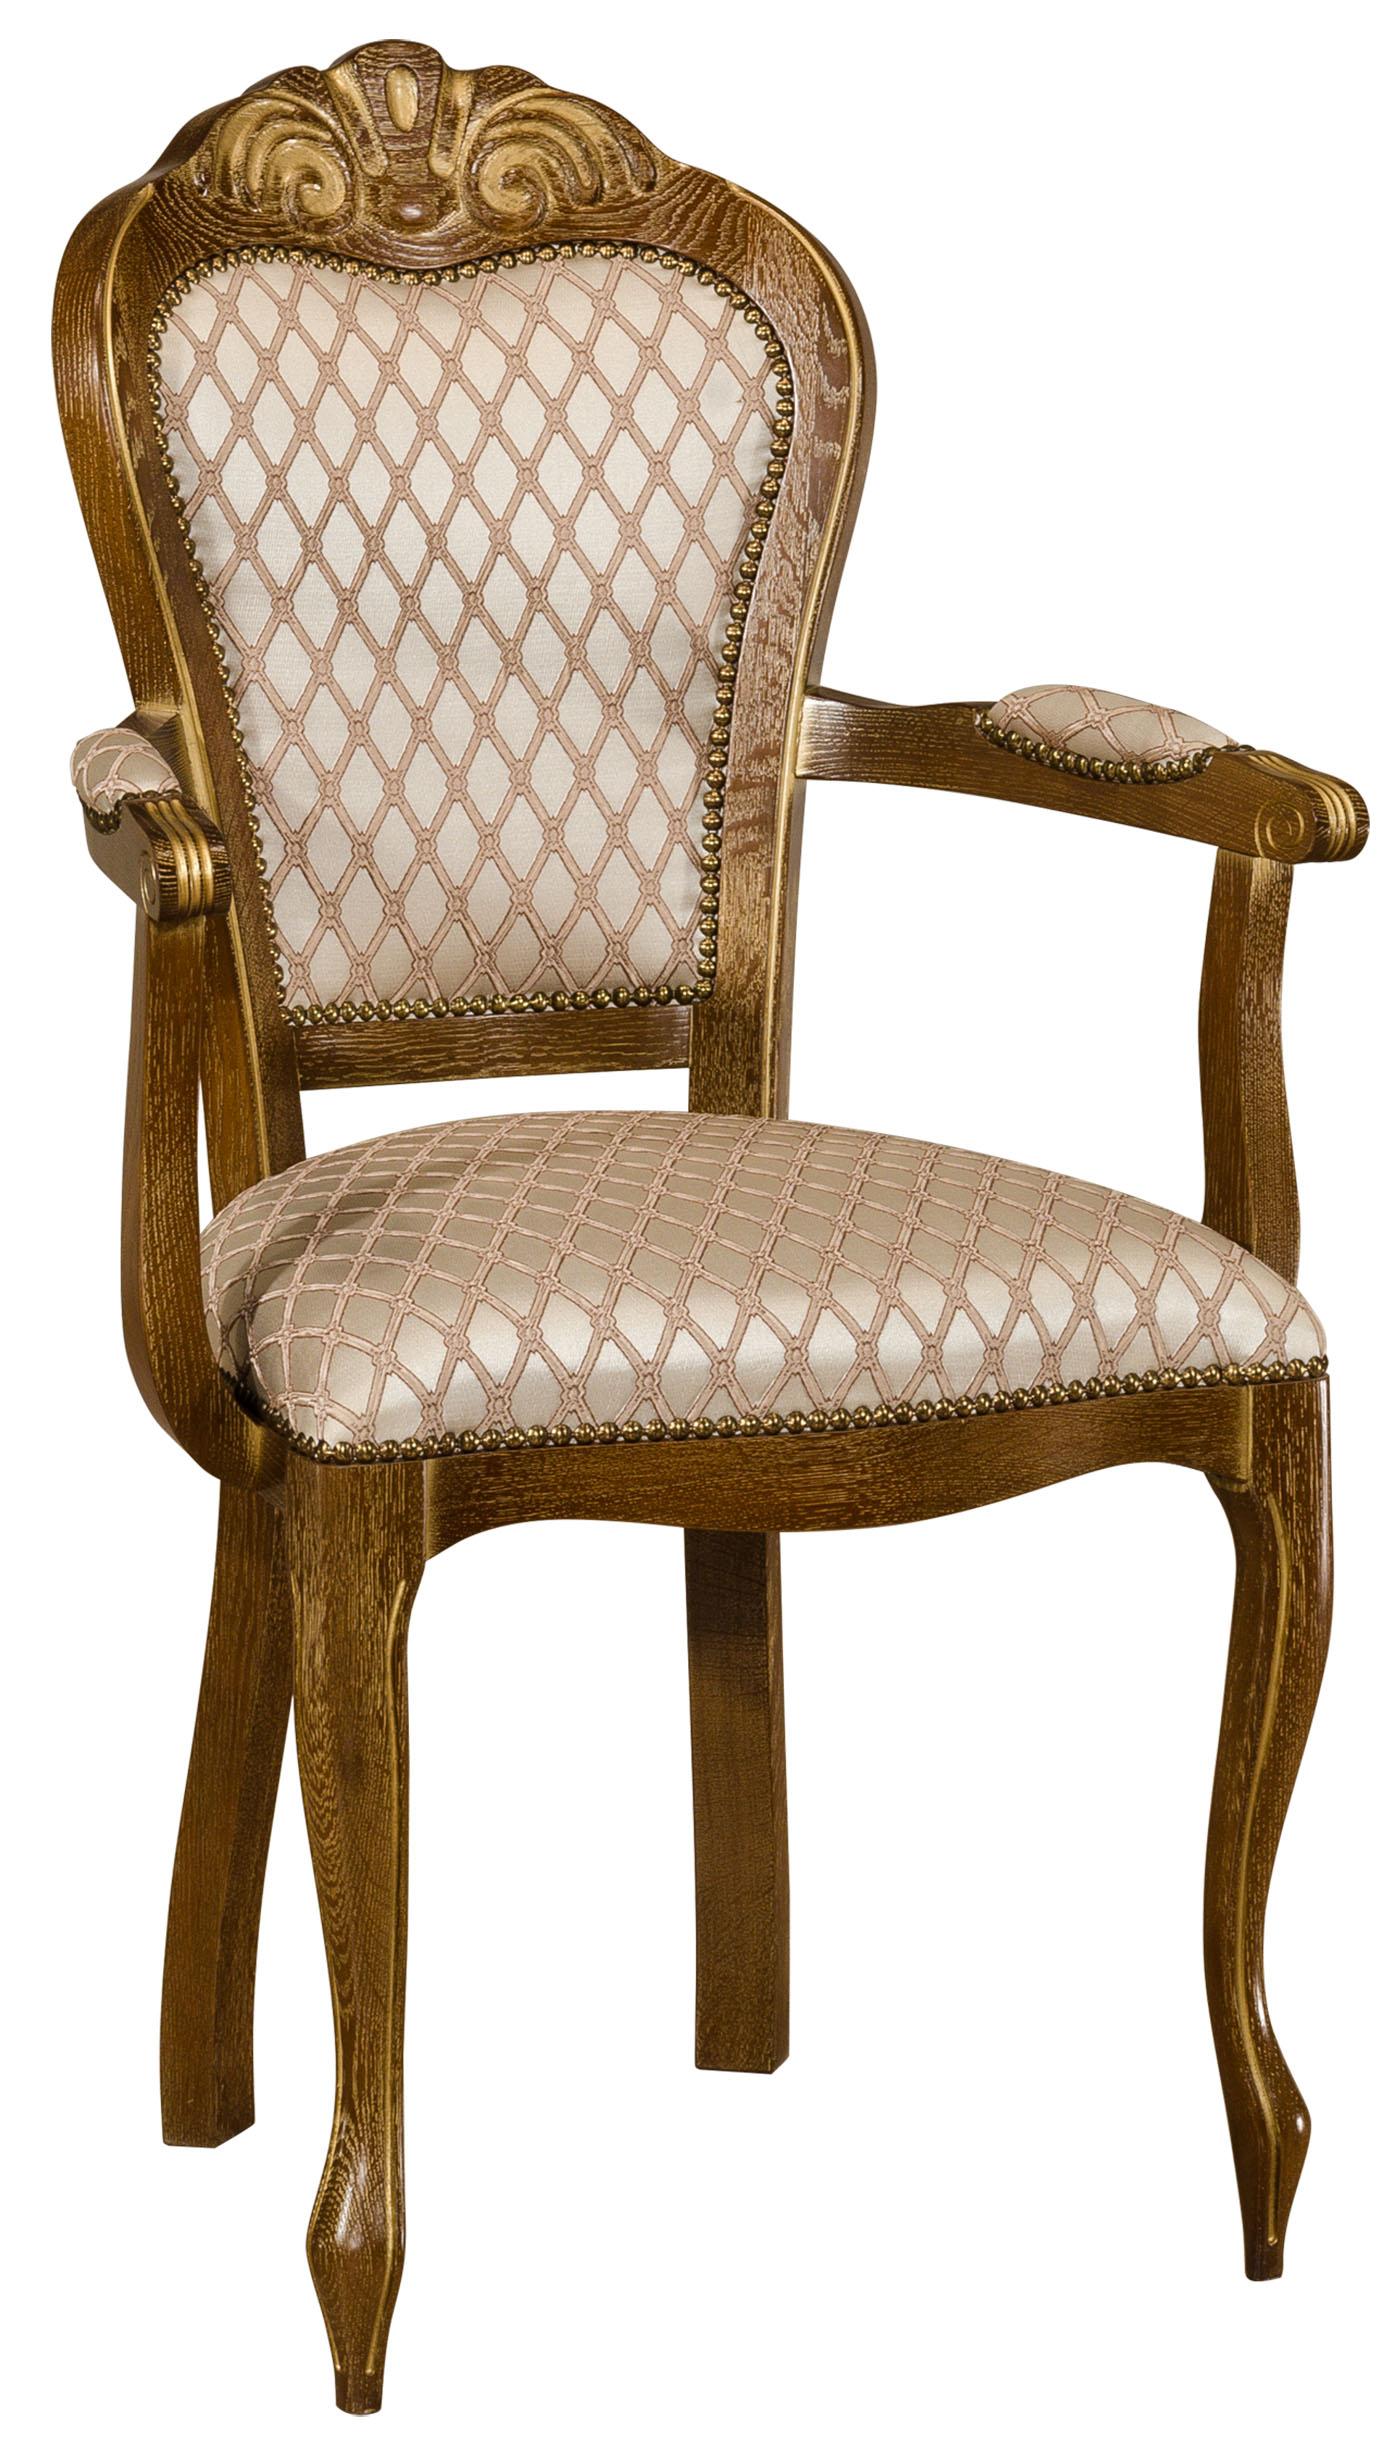 стул (Кресло) Мадрид